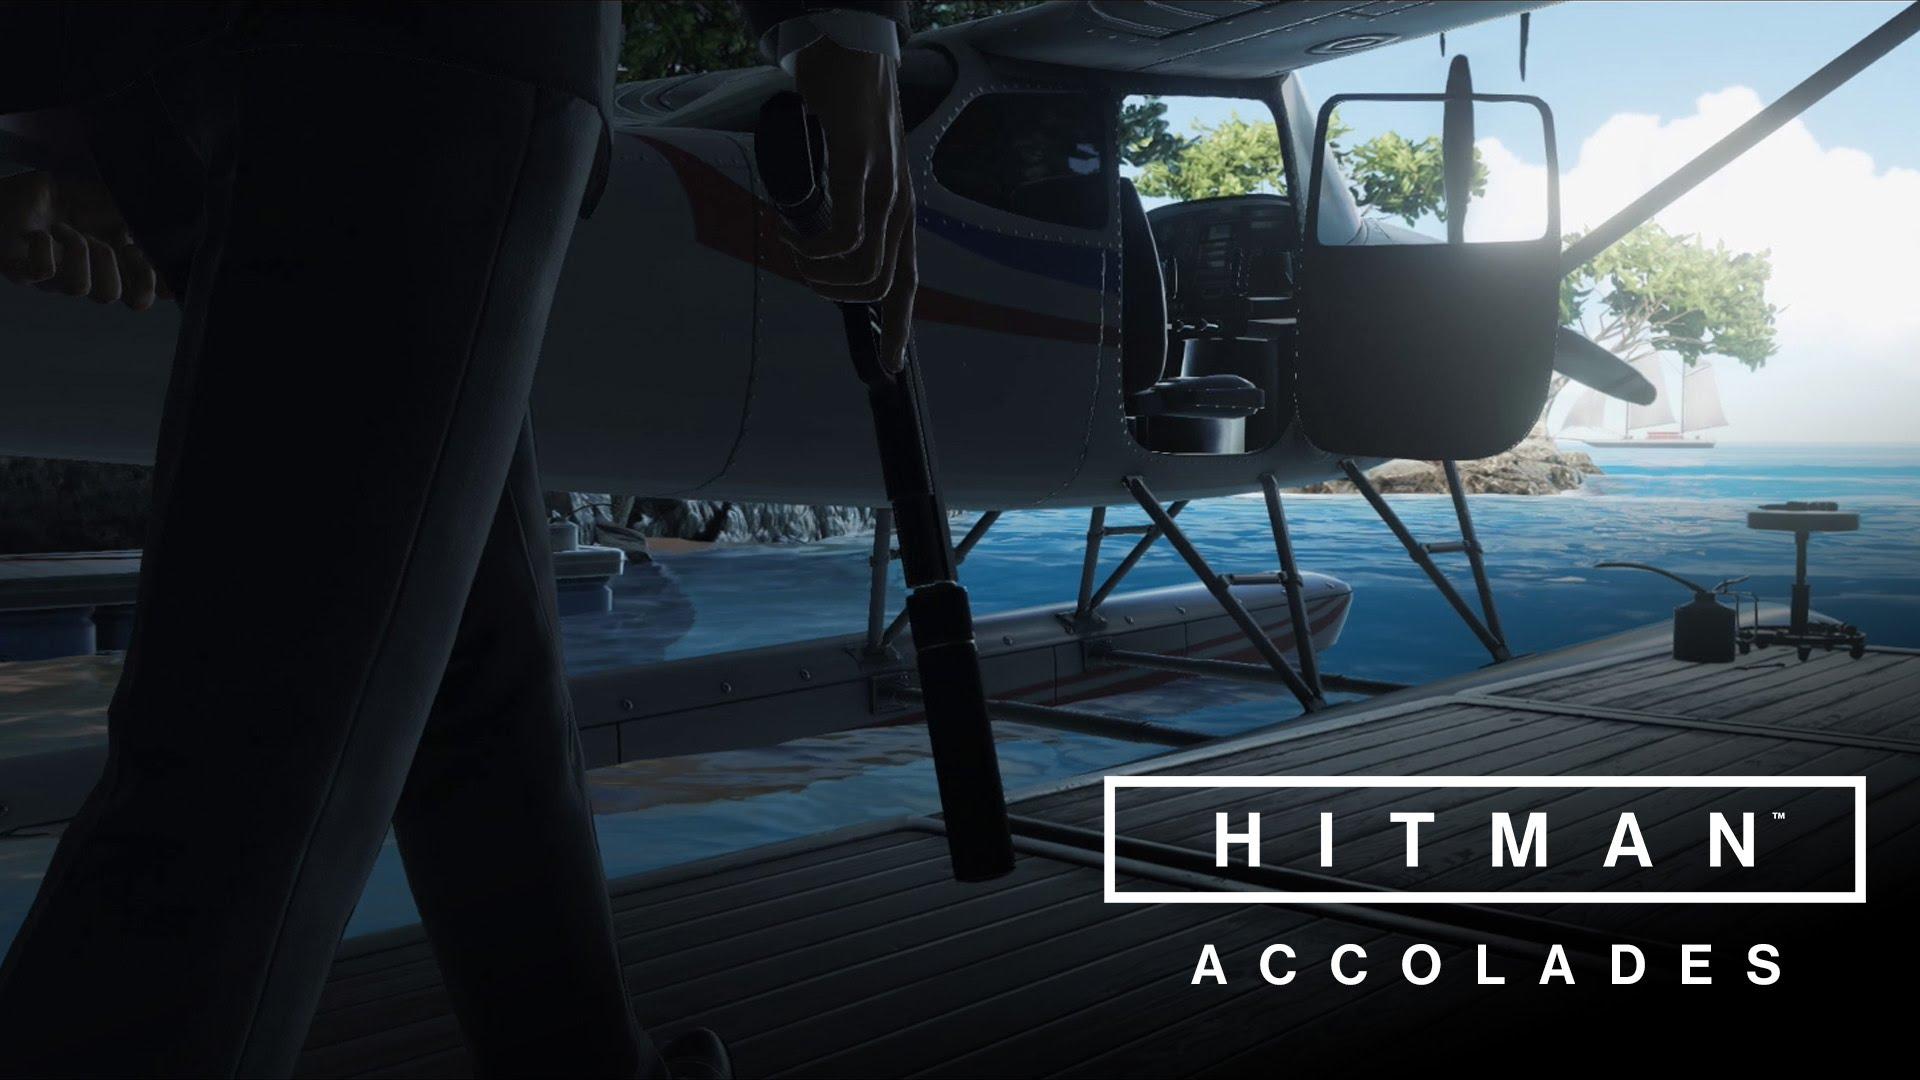 HITMAN - Accolades